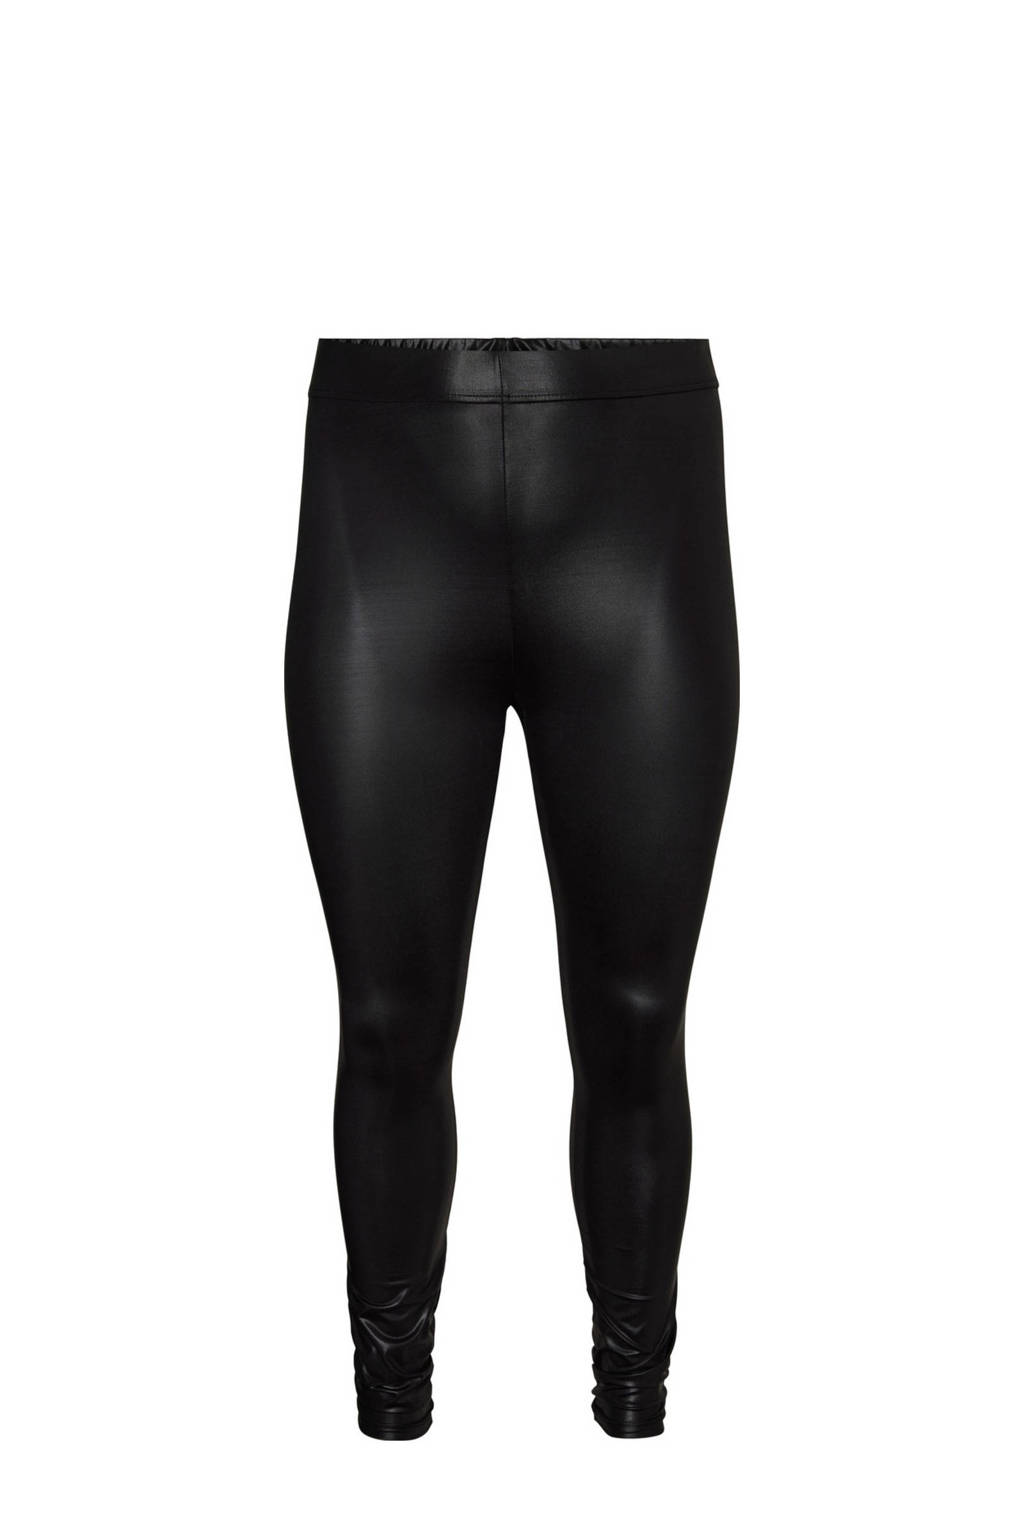 VERO MODA CURVE Plus Size gecoate legging VMSHINY zwart, Zwart